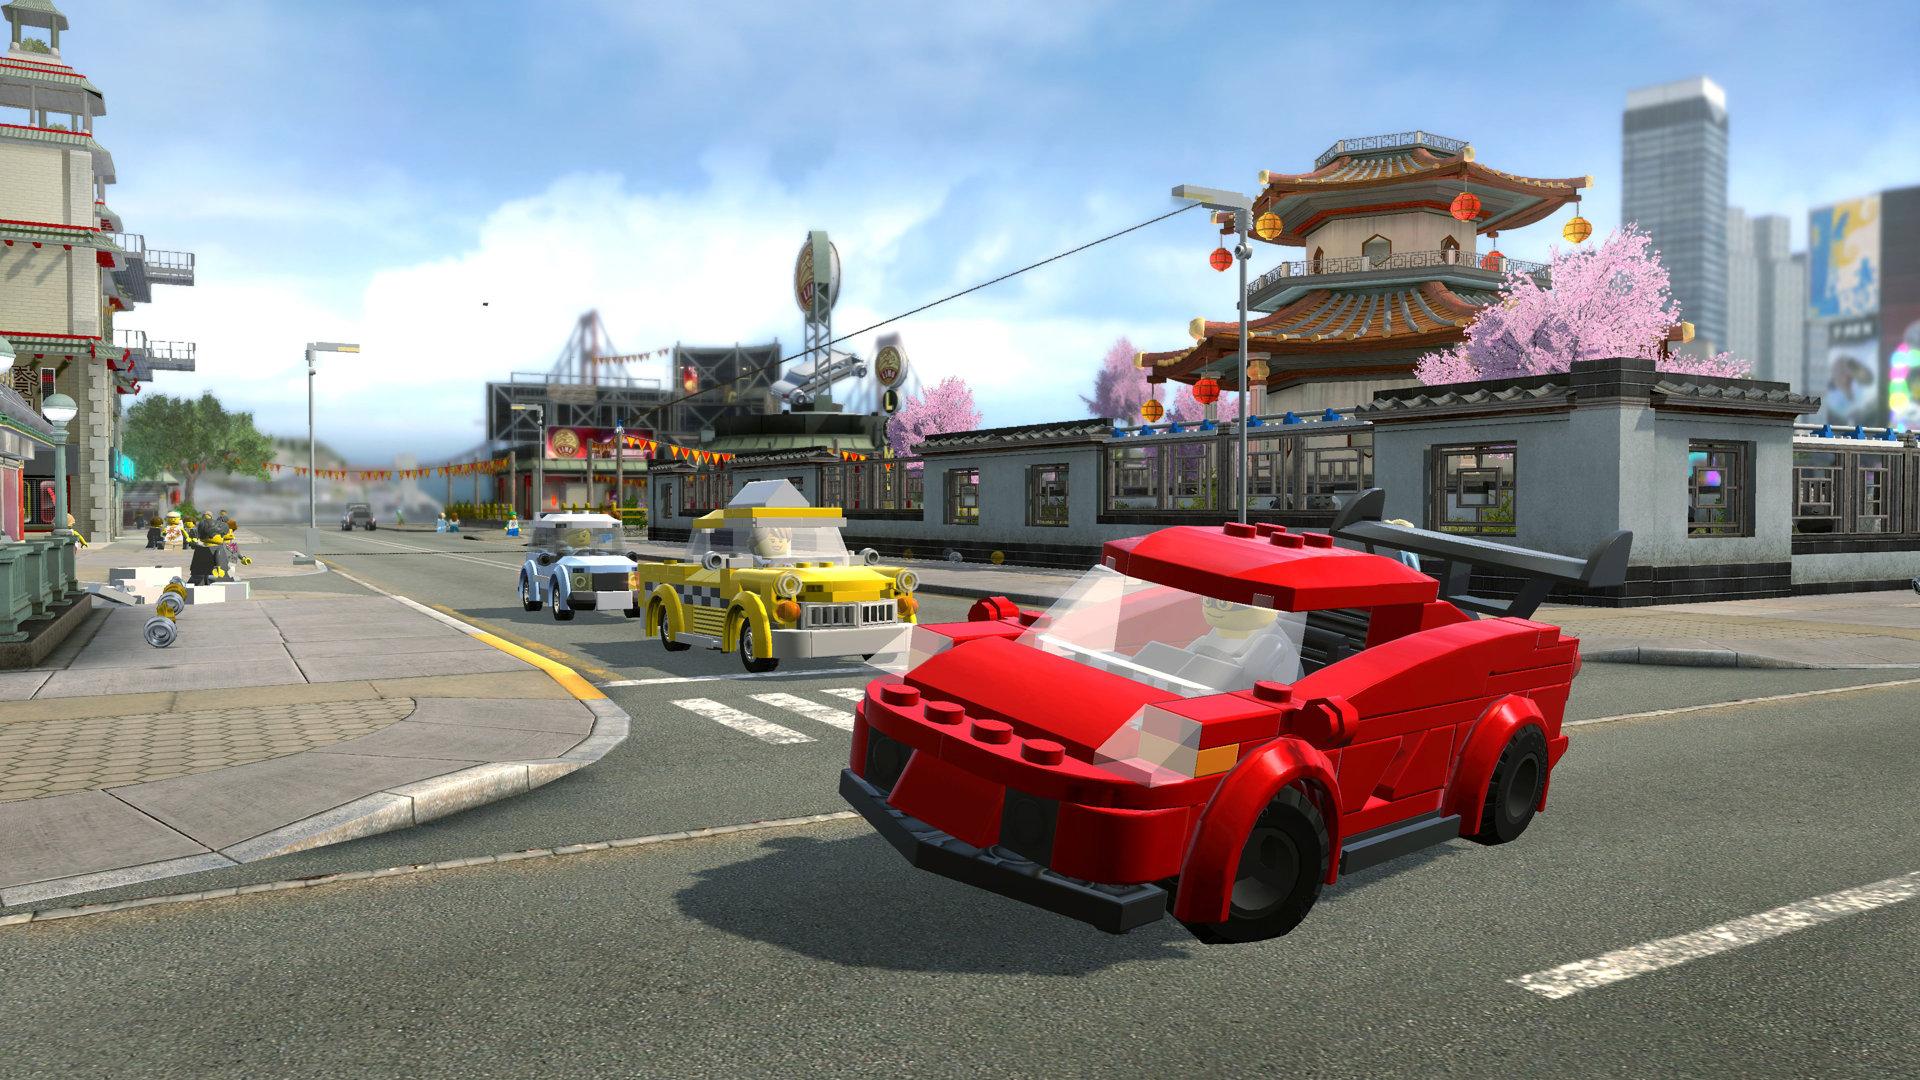 https://media.playstation.com/is/image/SCEA/lego-city-undercover-sports-car-screen-03-ps4-us-04jan16?$MediaCarousel_Original$